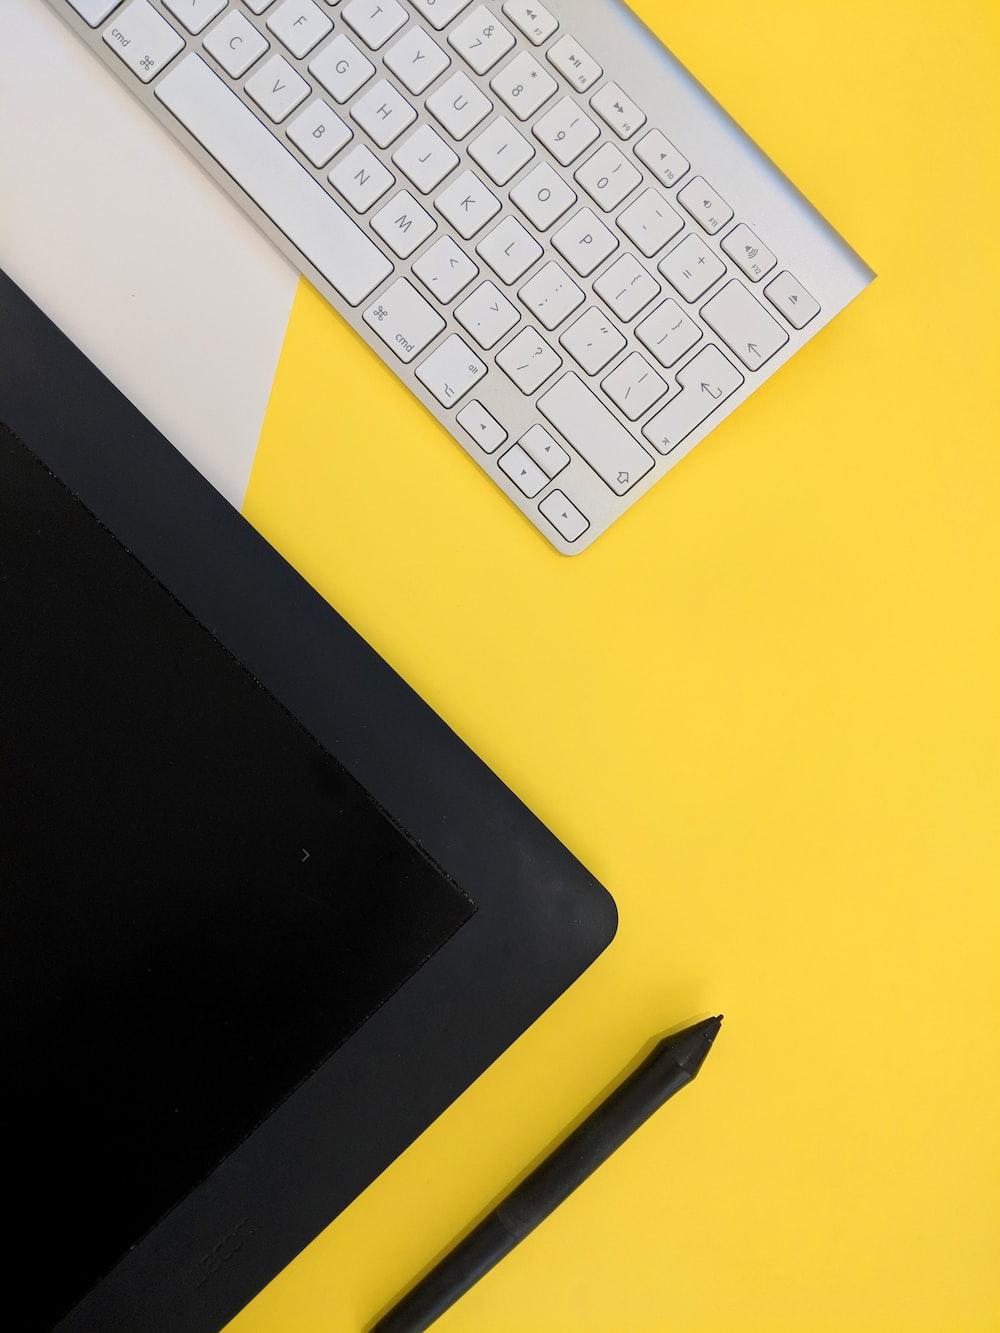 gray Apple wireless keyboard beside black tablet computer and stylus pen